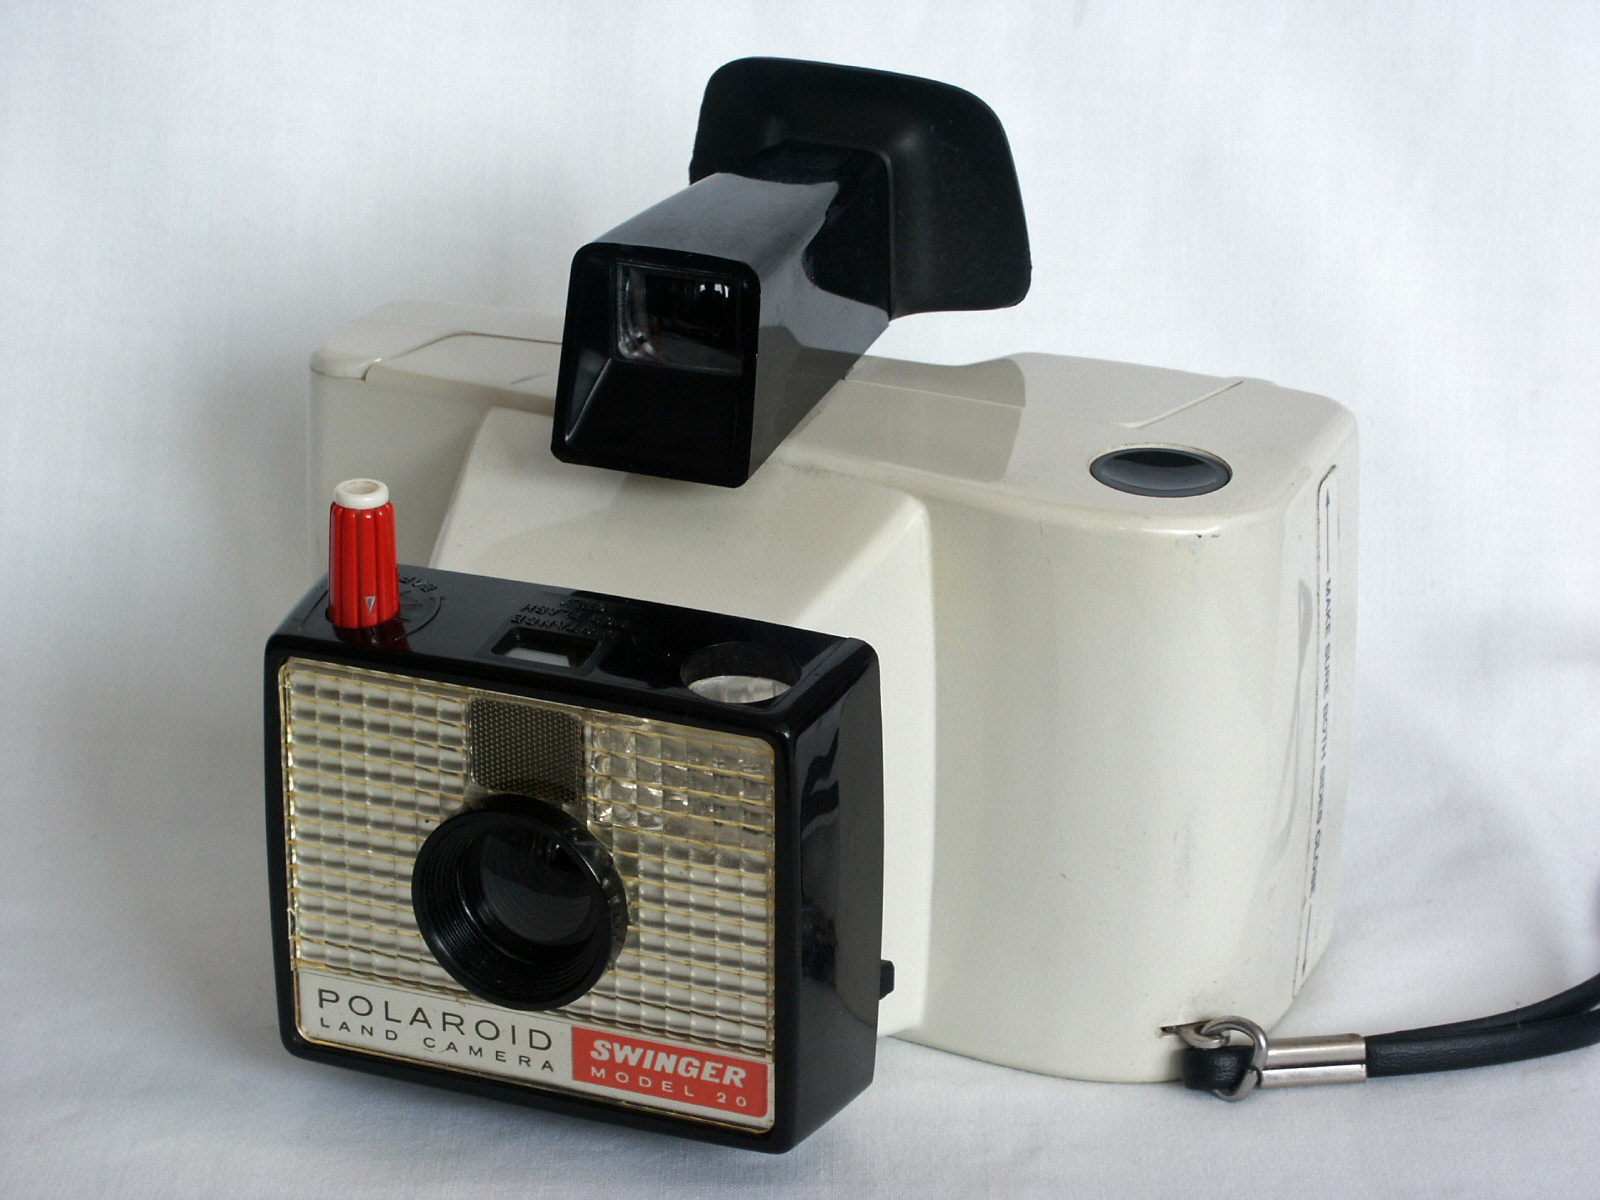 Polaroid swinger camera value